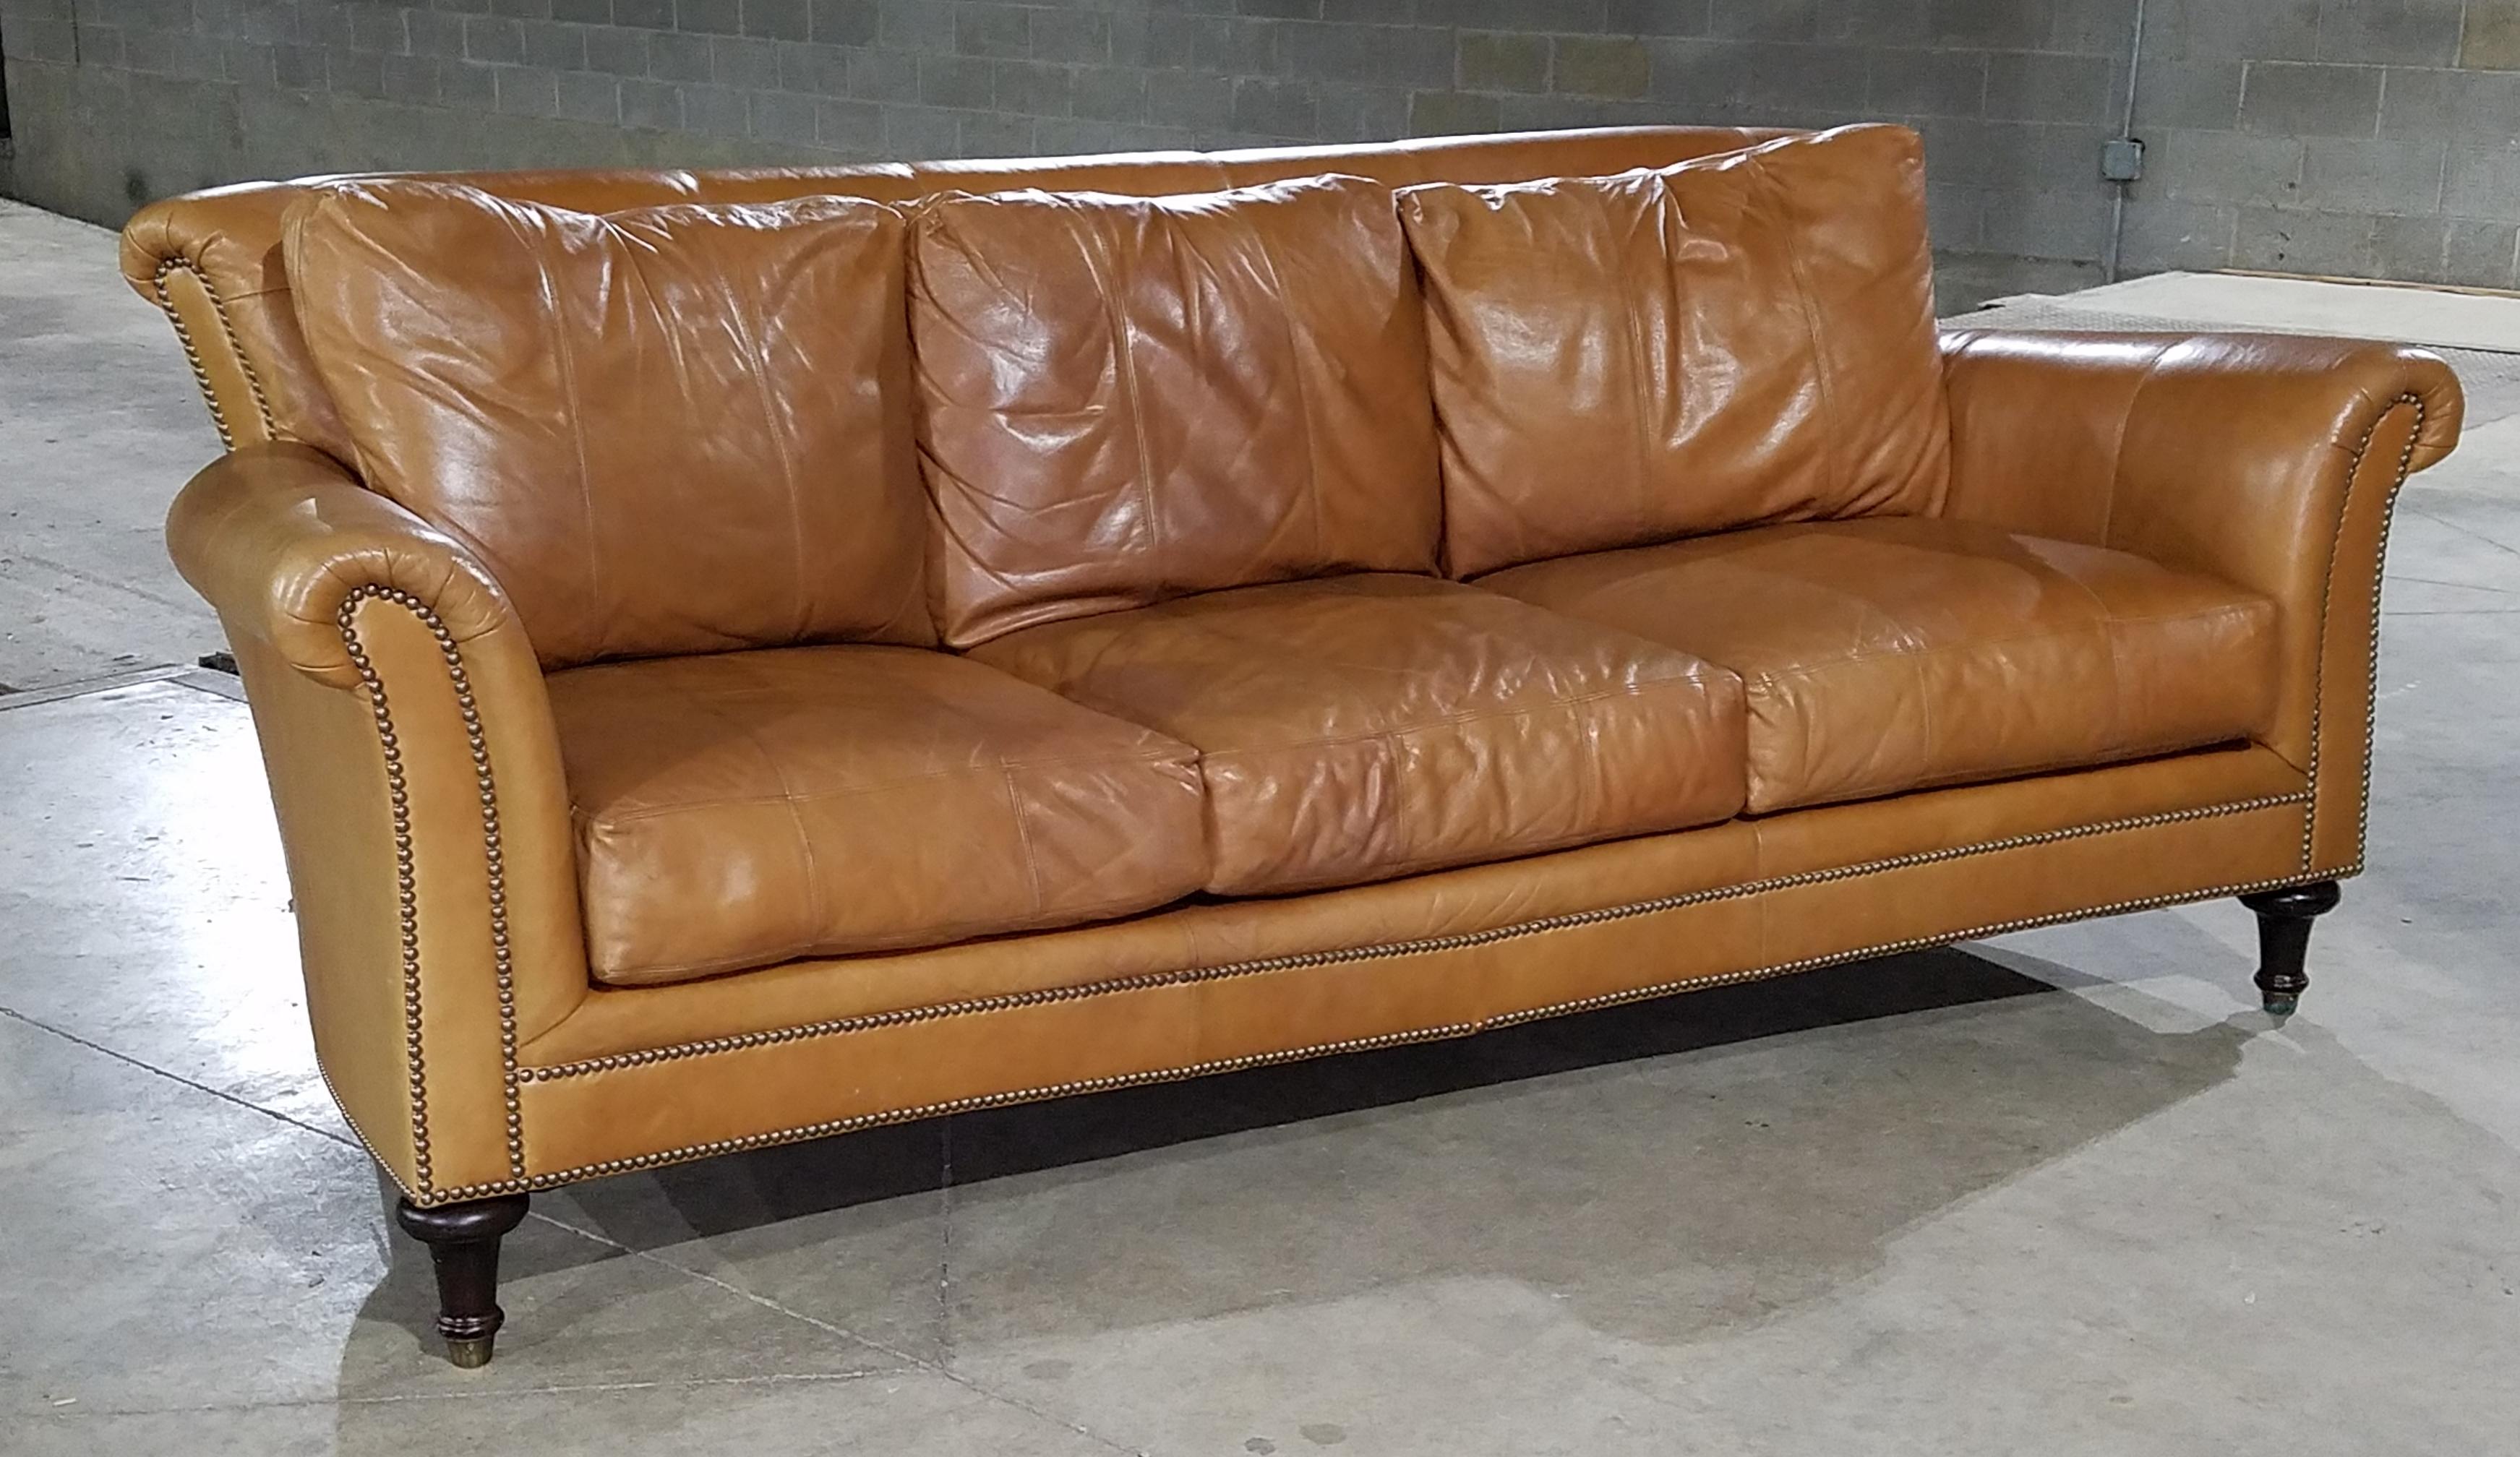 ferguson copeland leather sofa traditional chaddock surrey apartment